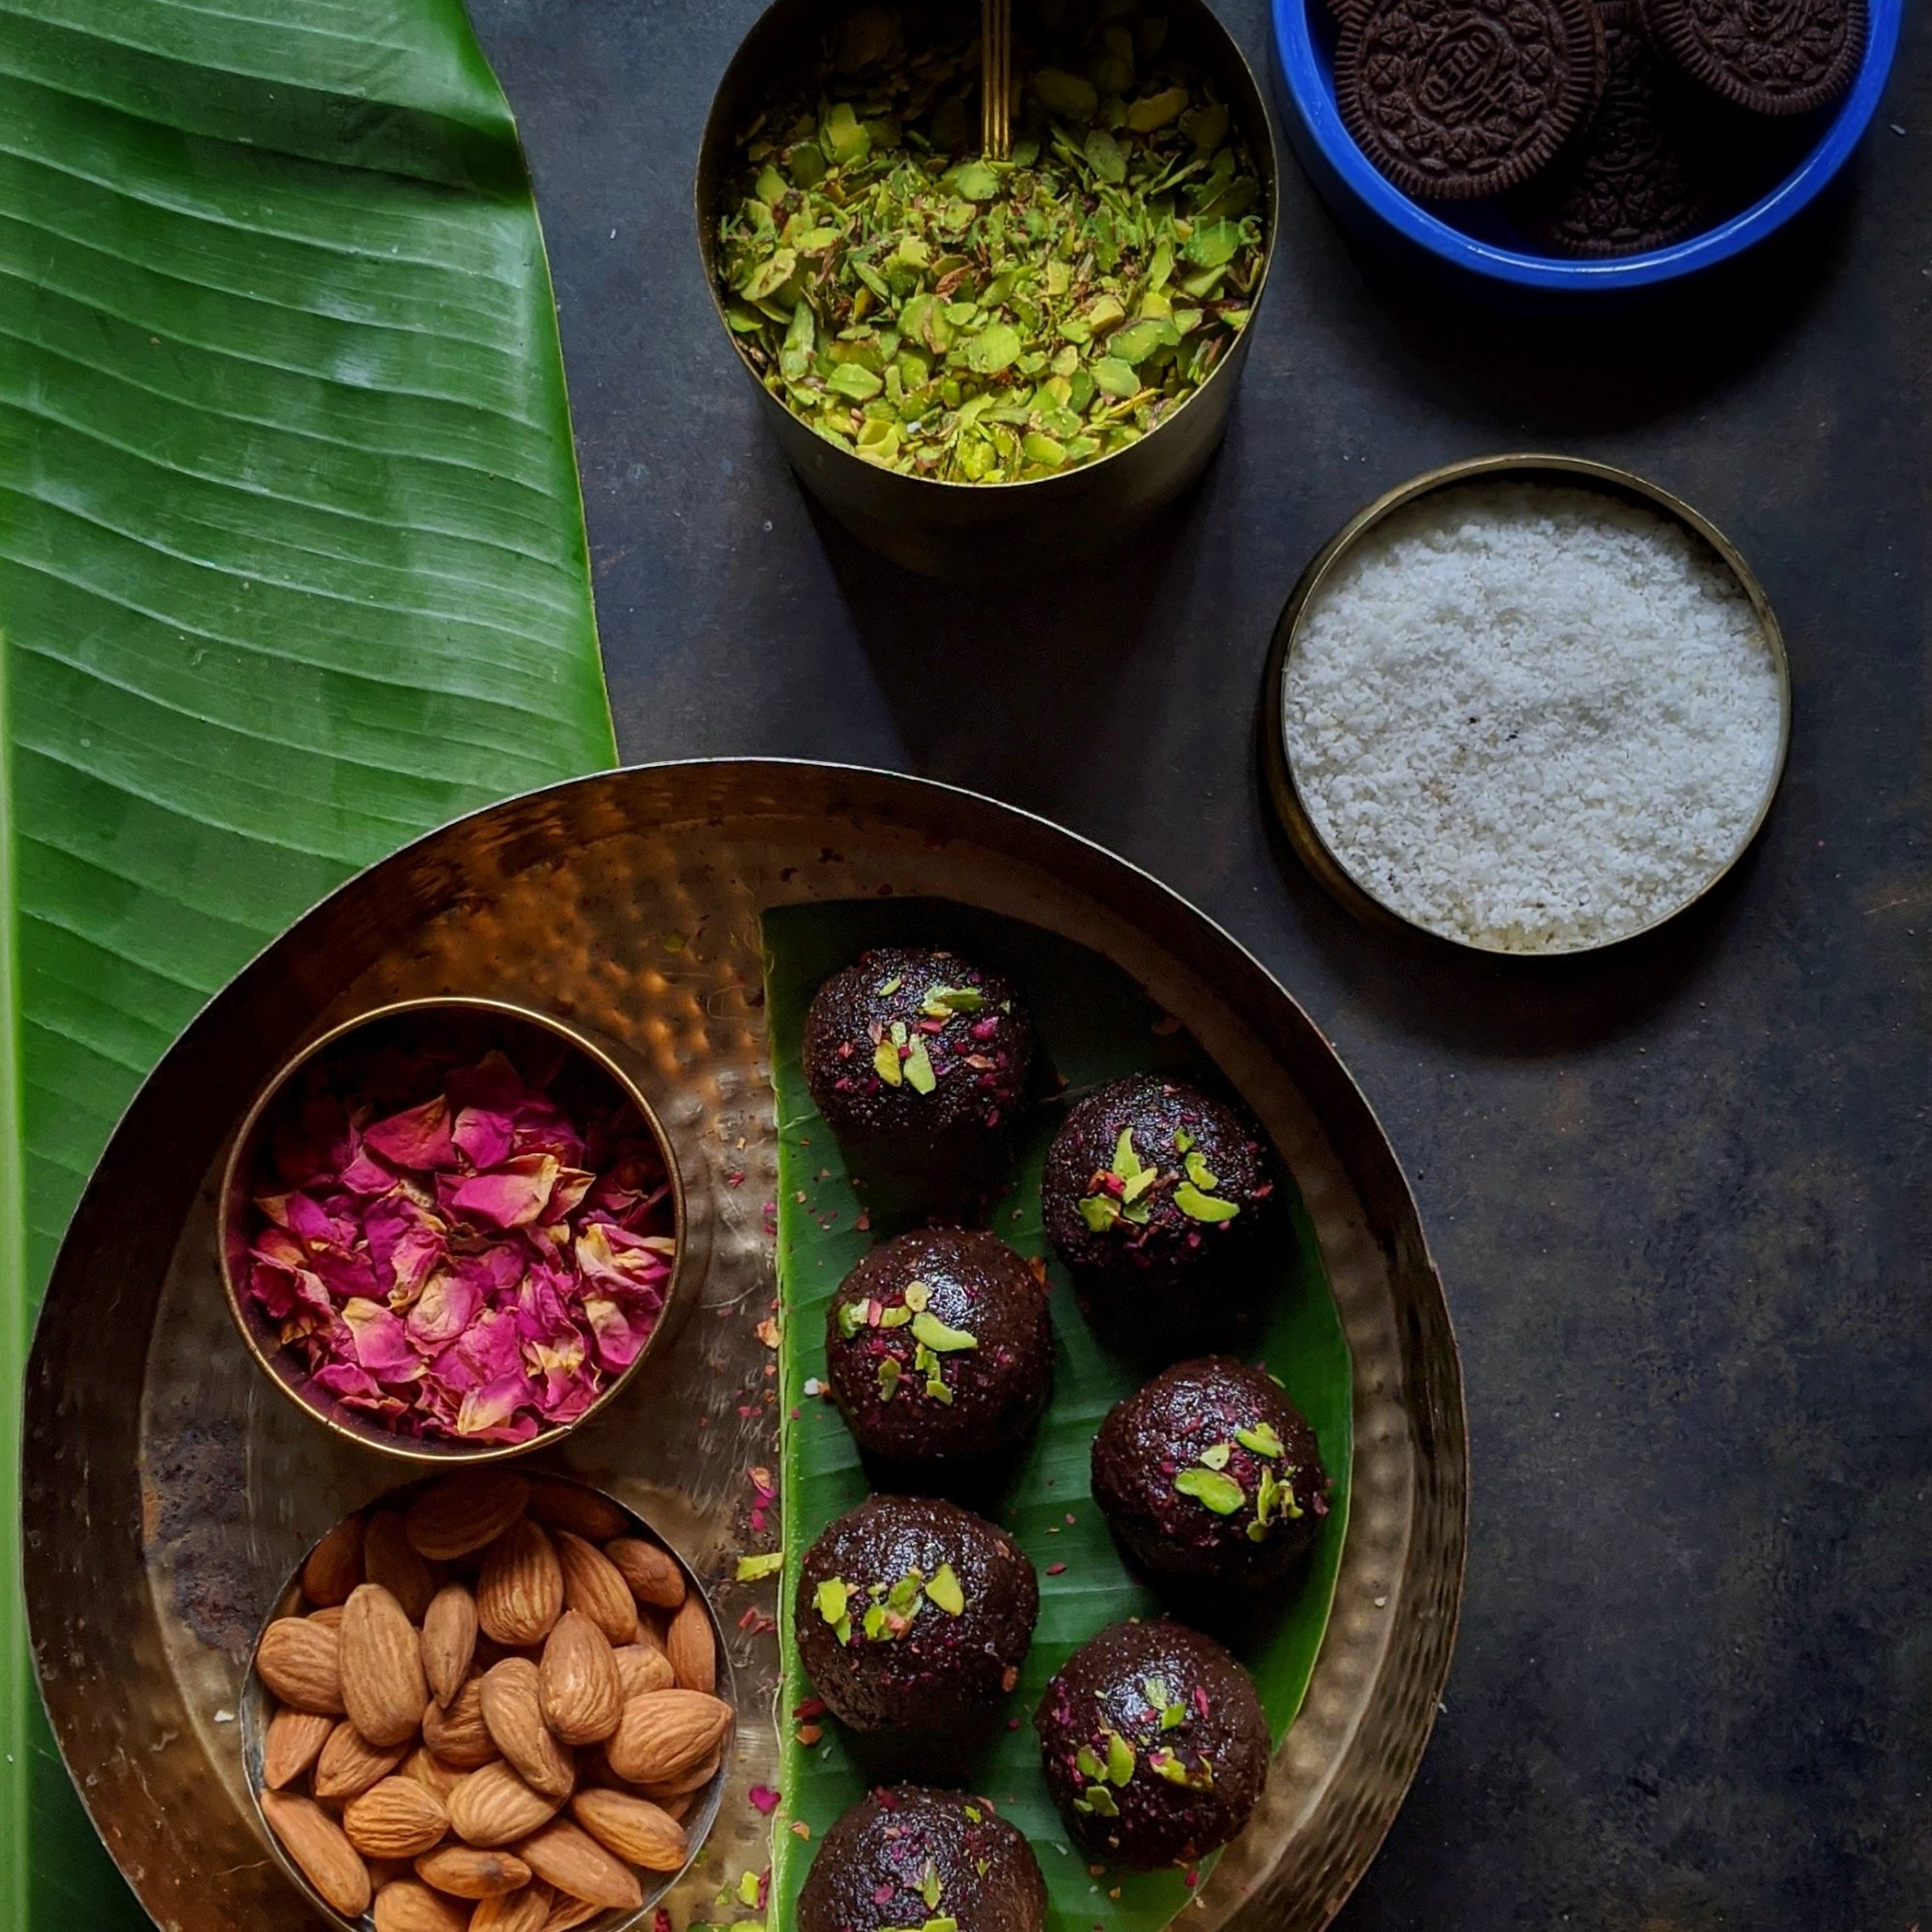 Oreo Surprise Coconut Laddoos are ready